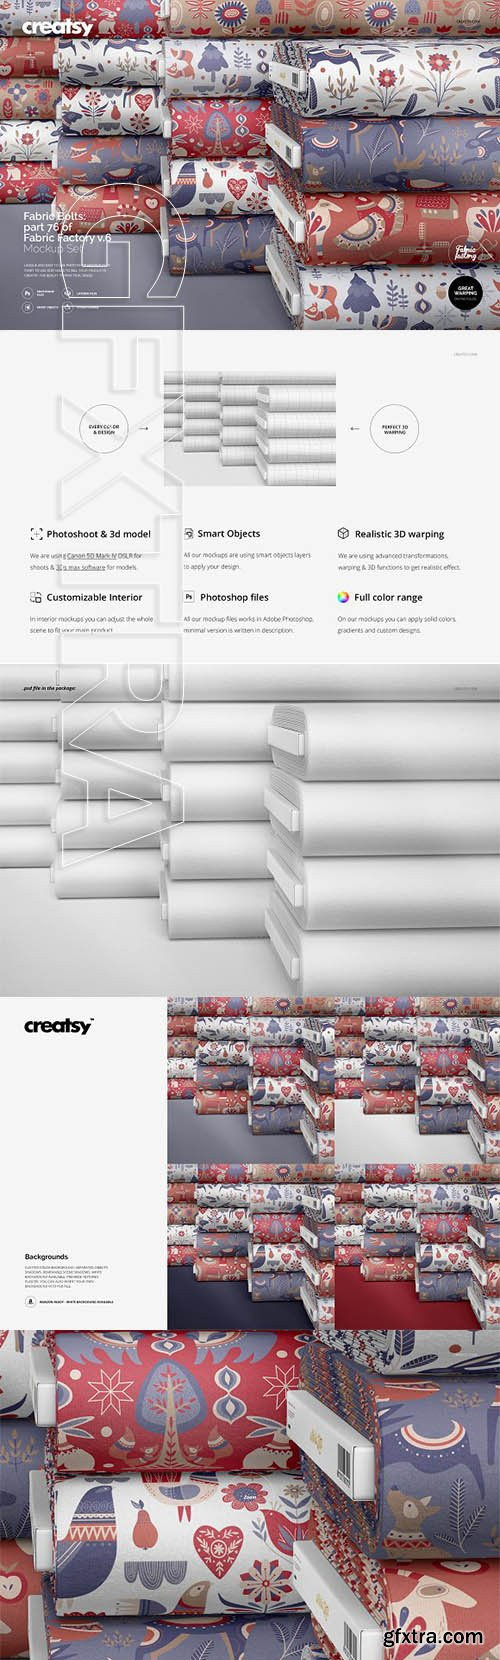 CreativeMarket - Fabric Bolts Mockup 76FF v6 3351144